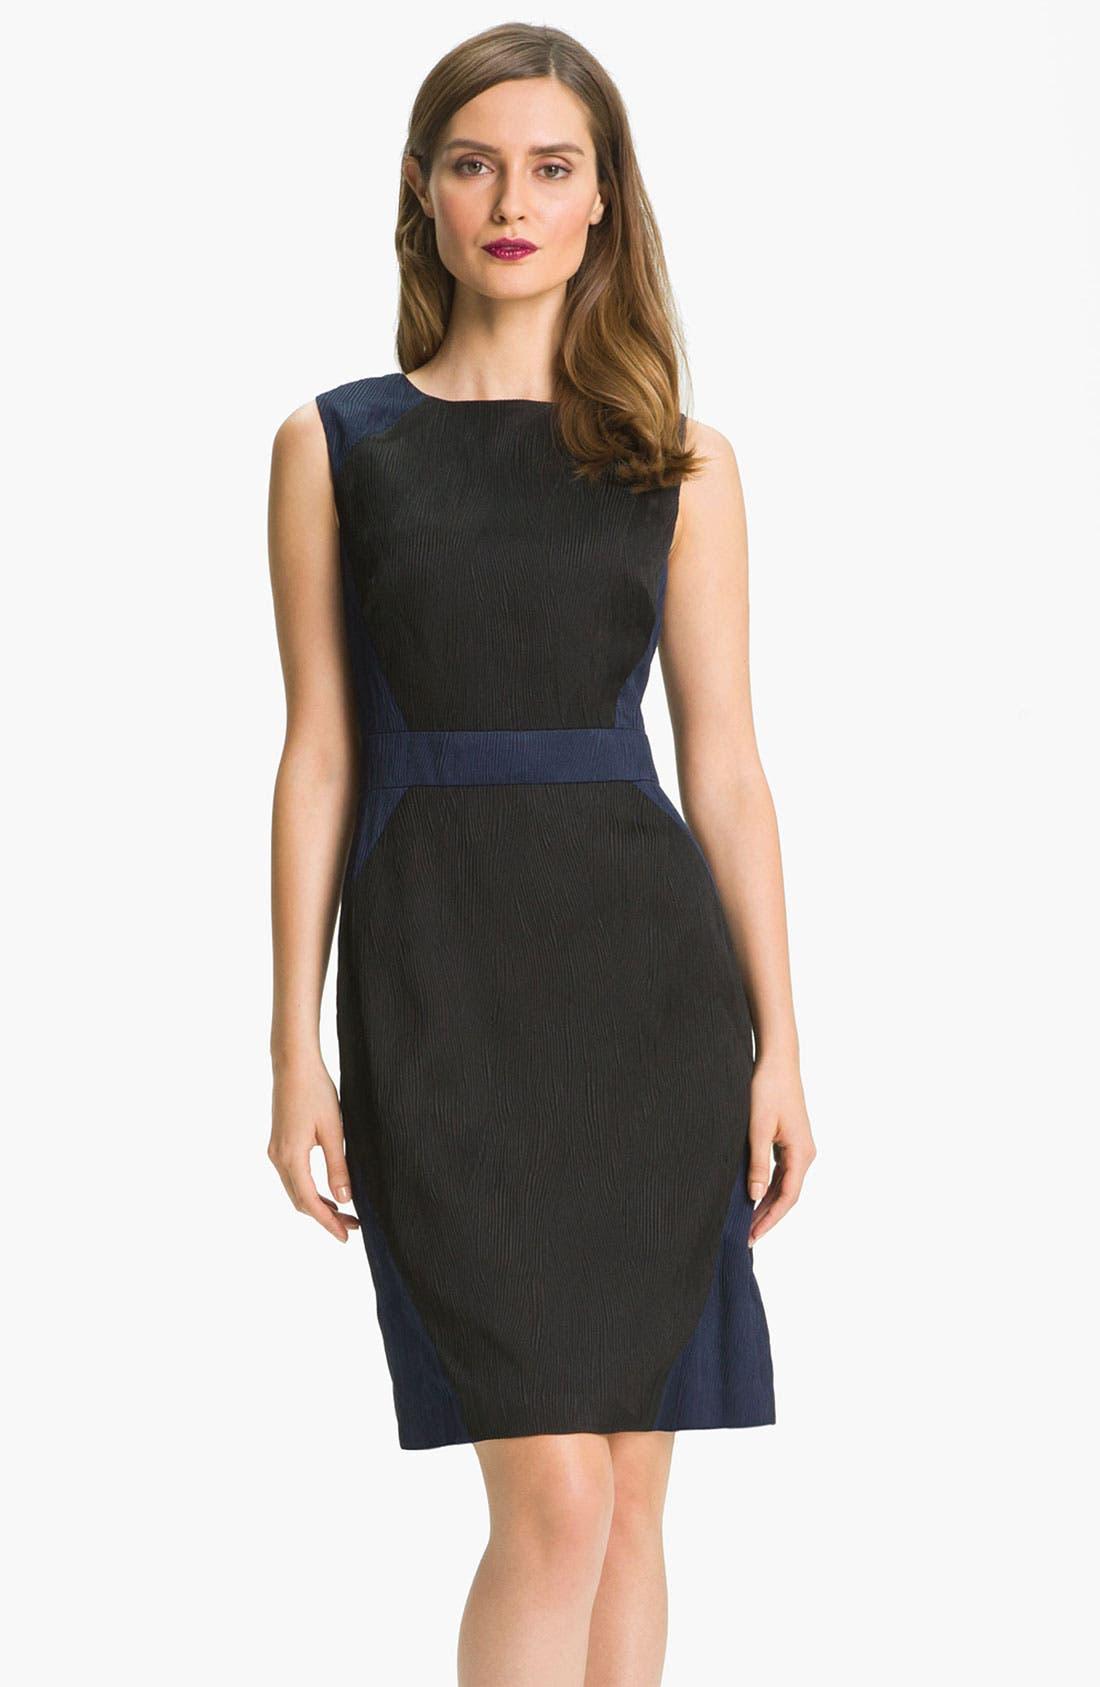 Alternate Image 1 Selected - Adrianna Papell Colorblock Jacquard Sheath Dress (Petite)